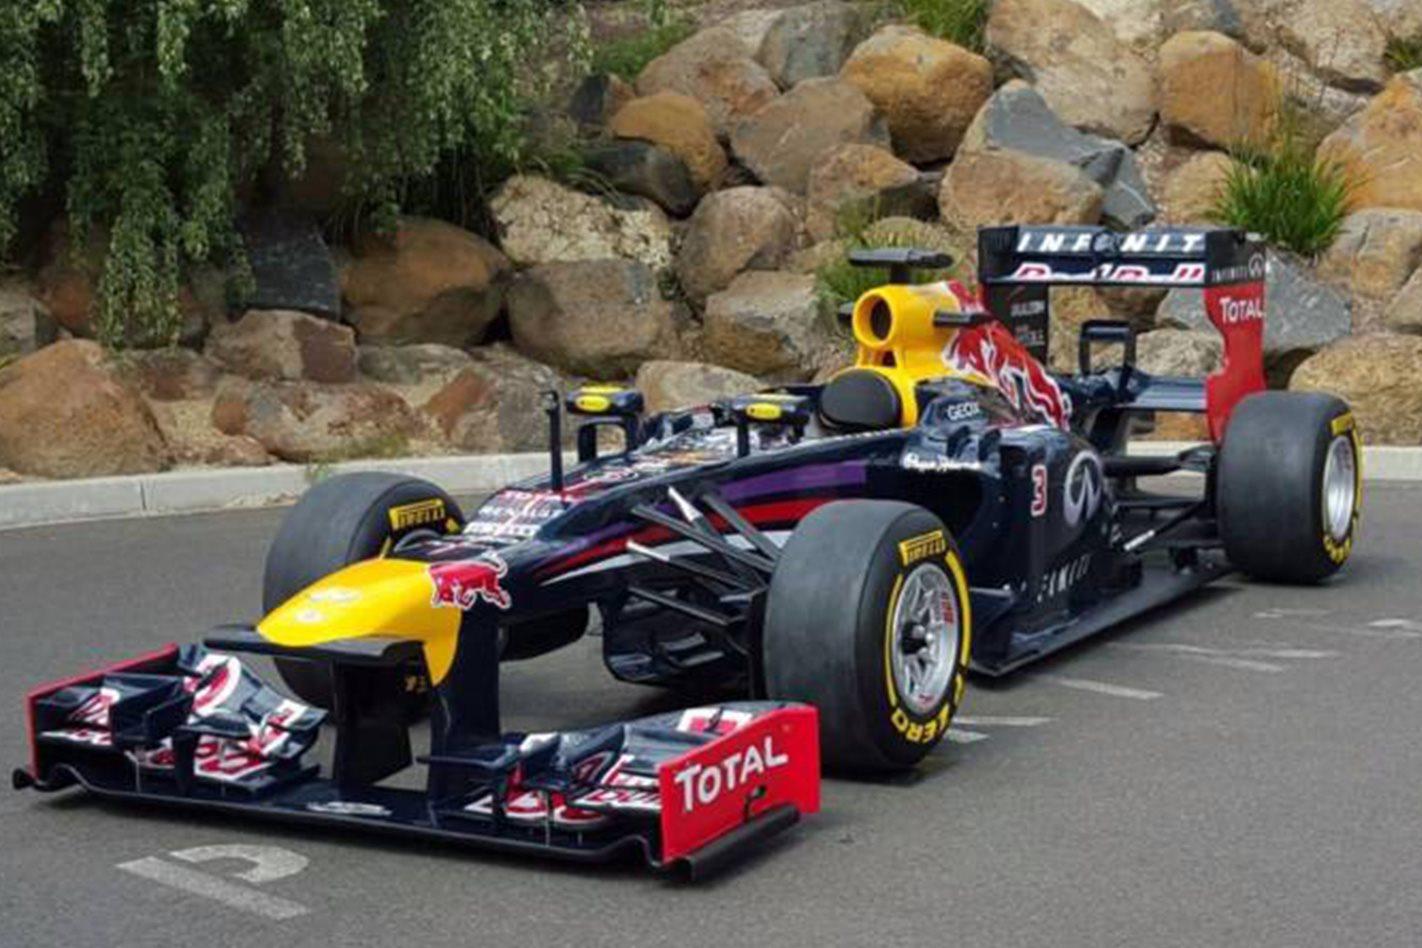 2013 Red Bull F1 Car For Sale In Australia